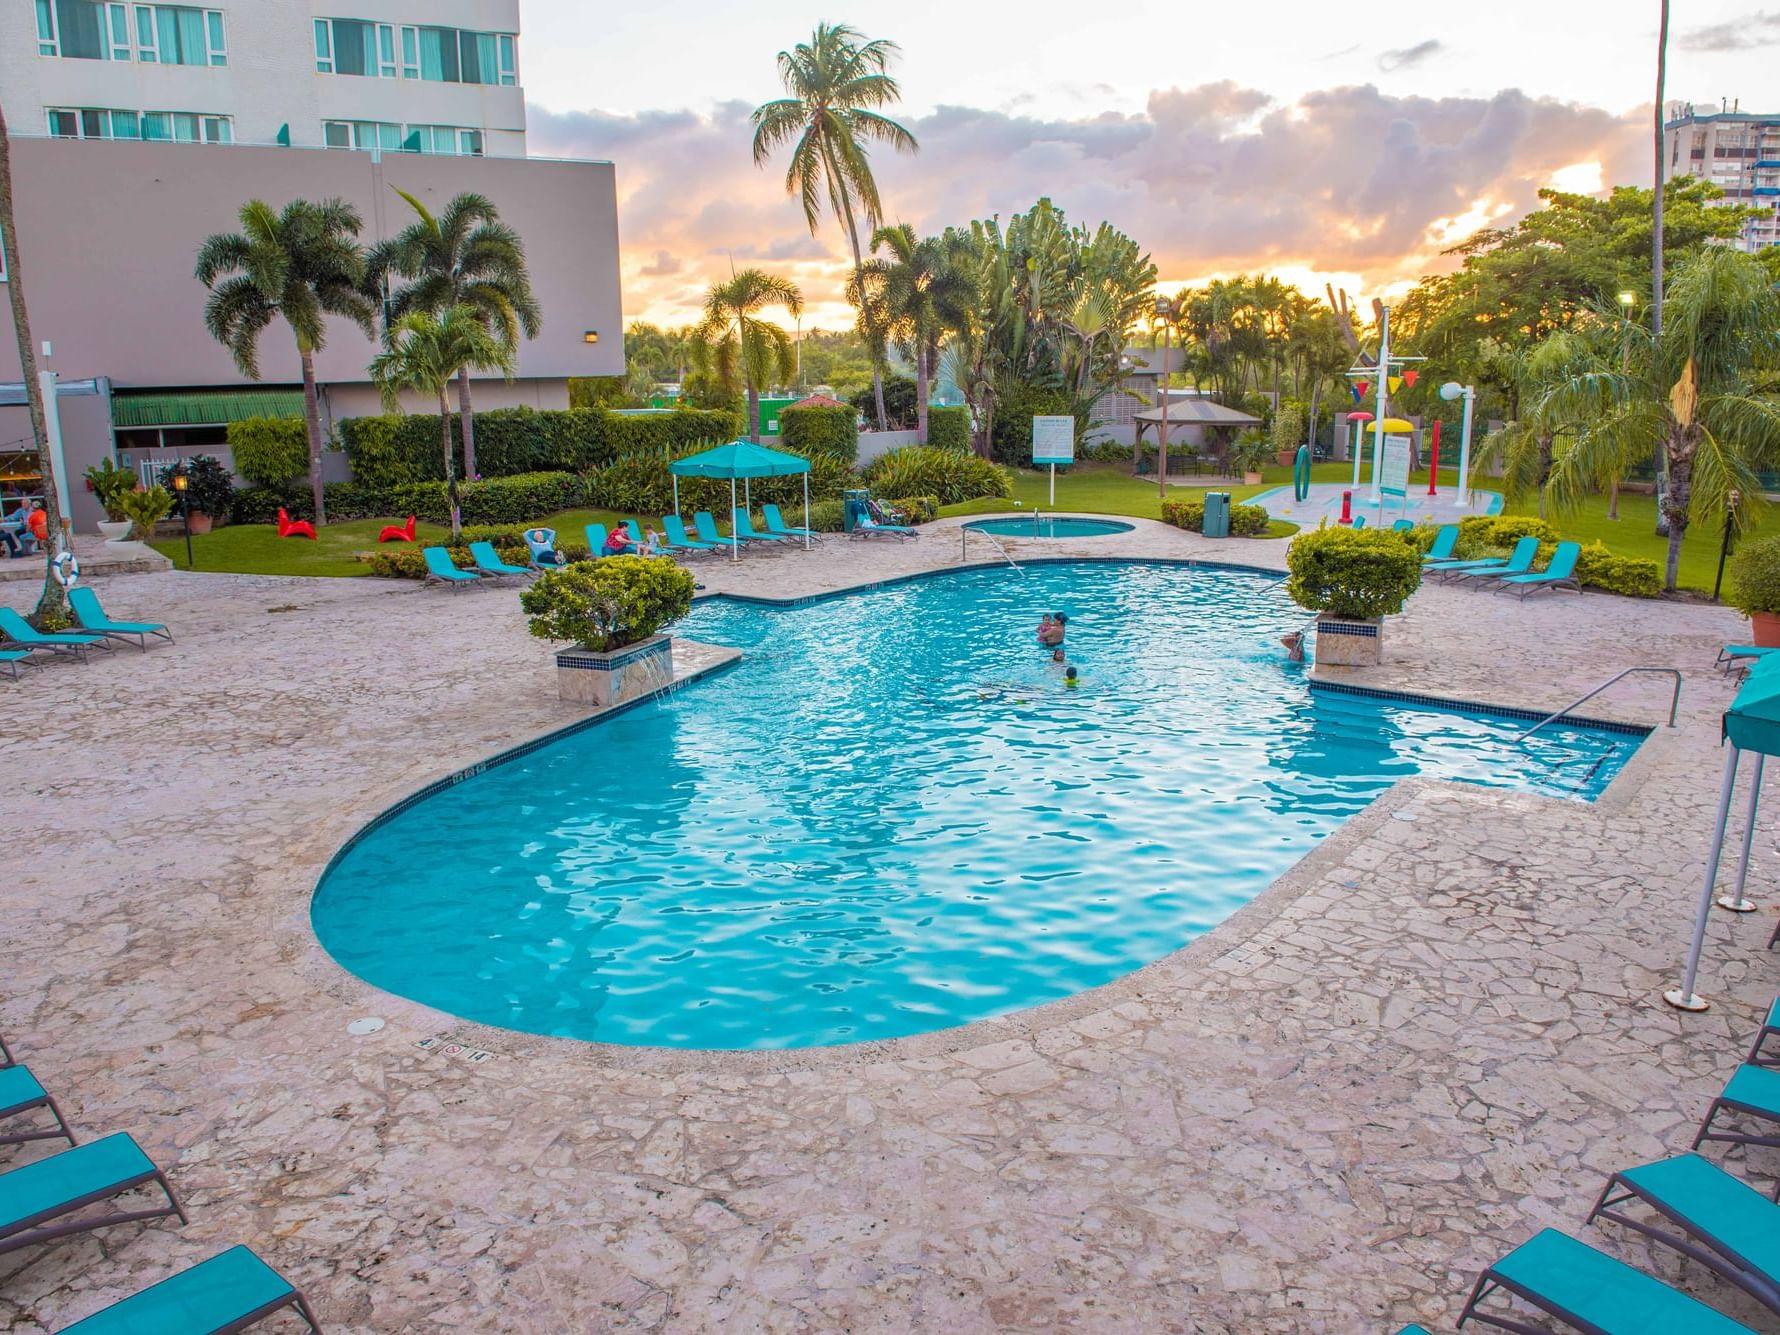 Verdanza Hotel Pool